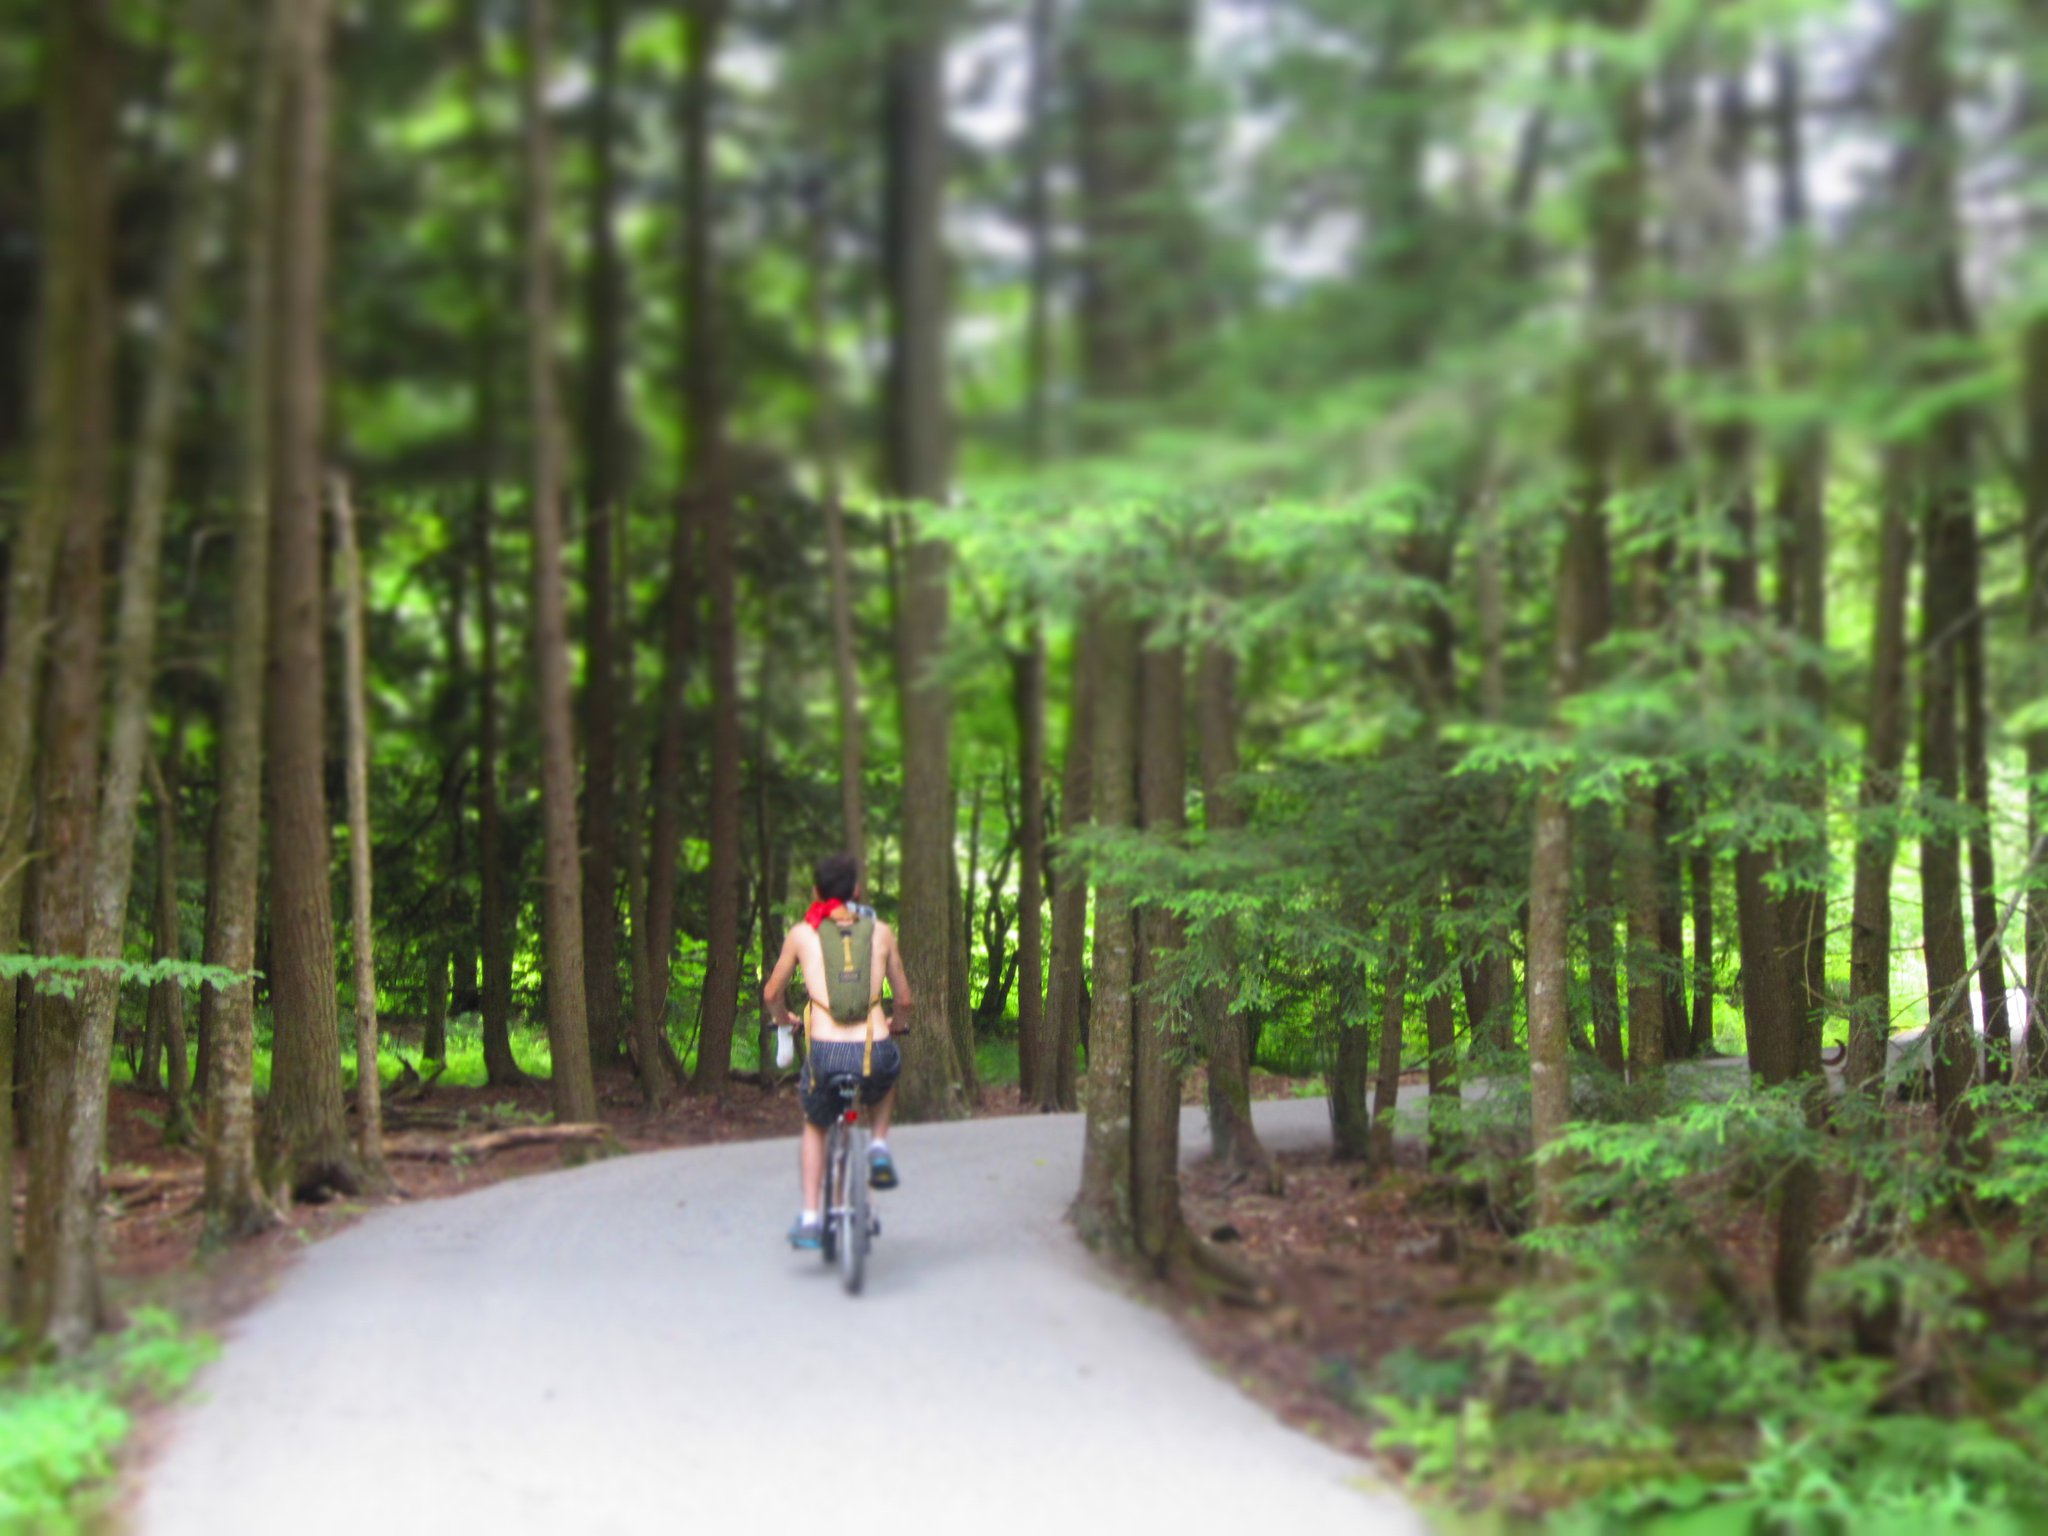 trail bike nick.jpg